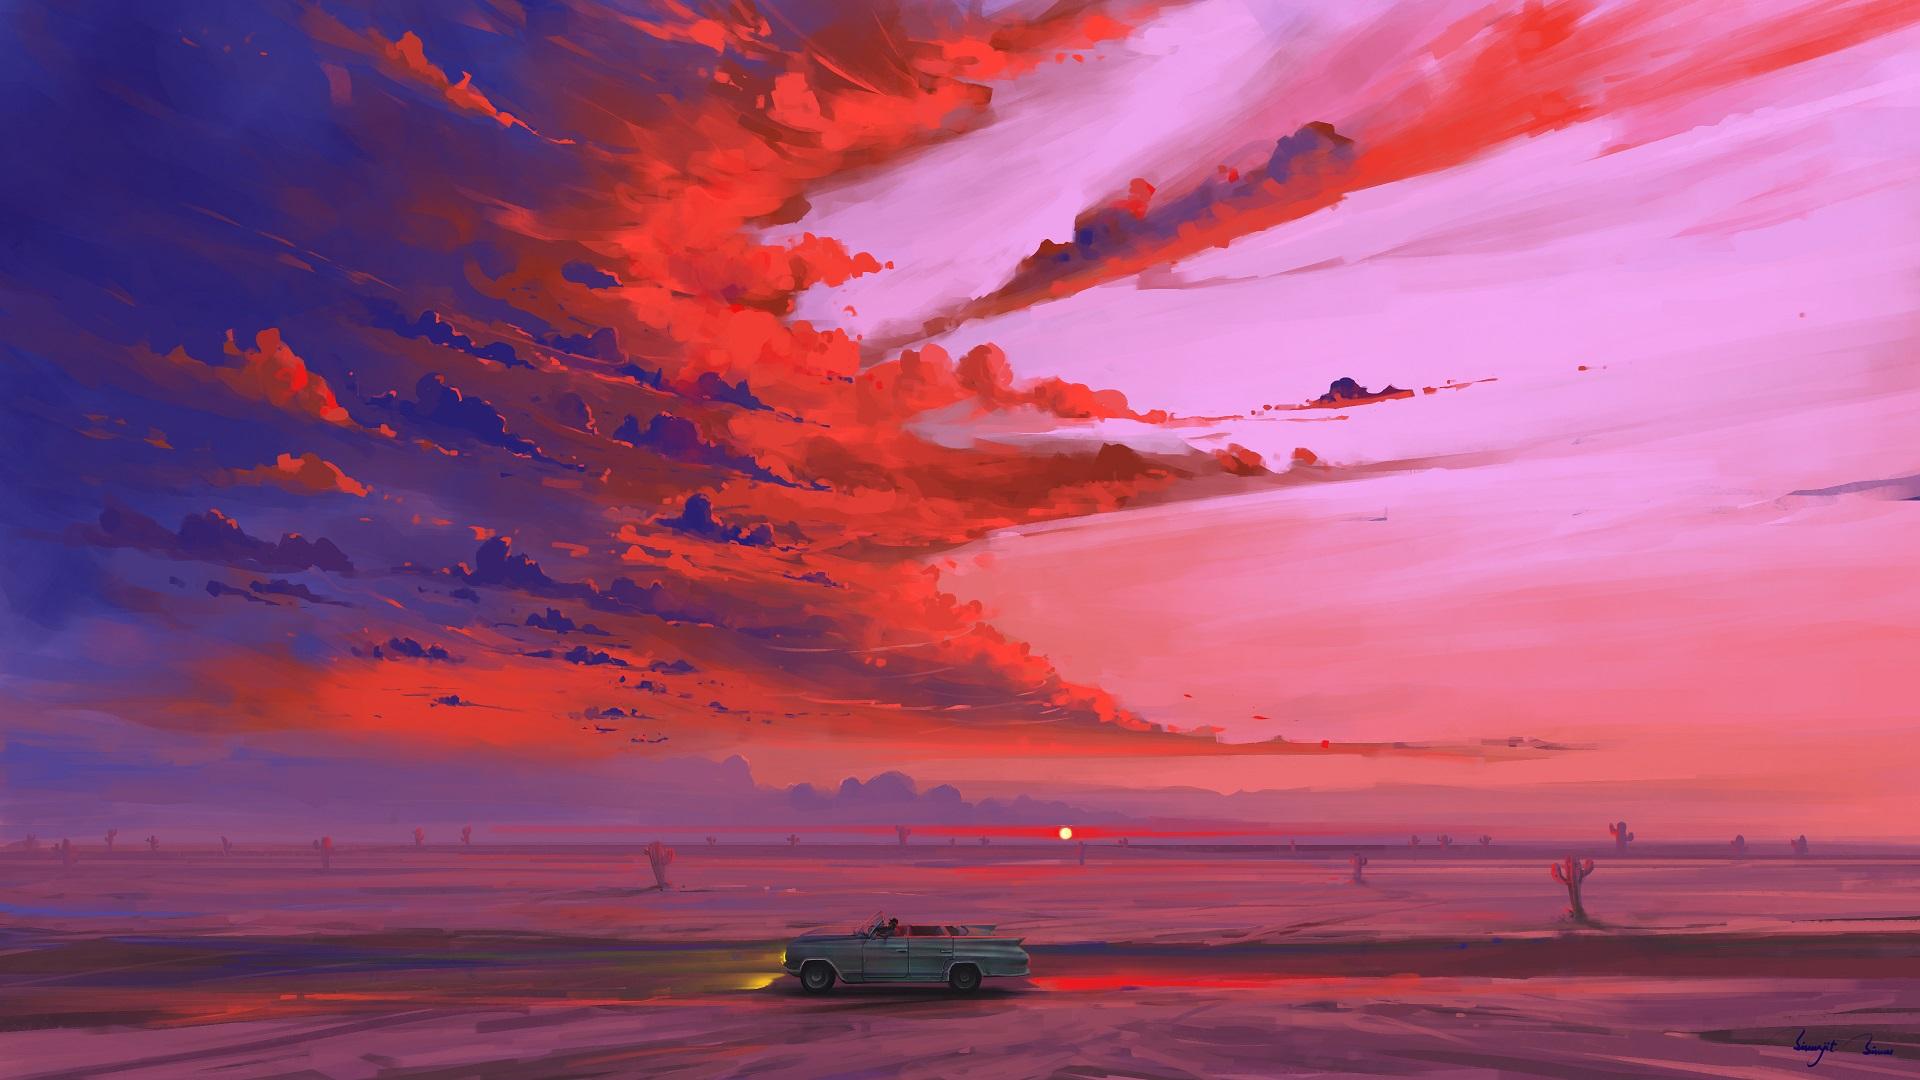 General 1920x1080 sunrise desert car road cactus digital art clouds BisBiswas